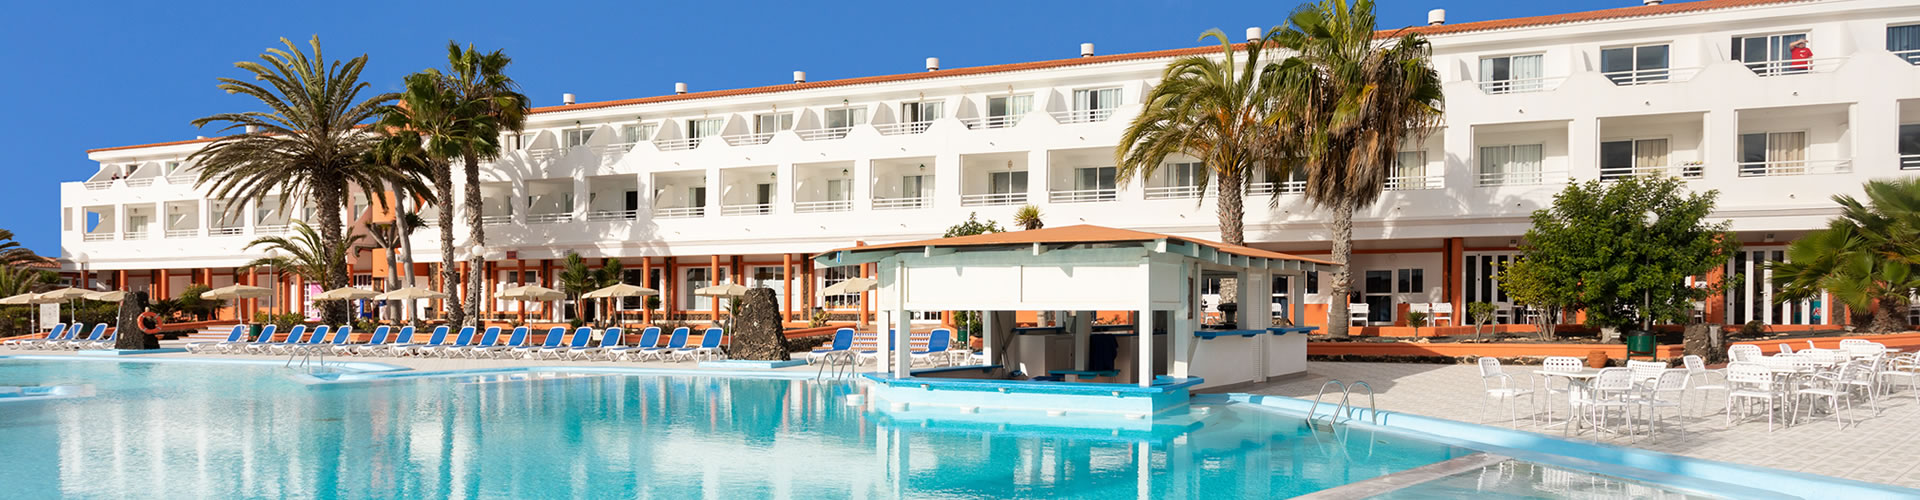 Globales costa tropical costa de antigua hoteles globales - Apartamentos todo incluido fuerteventura ...